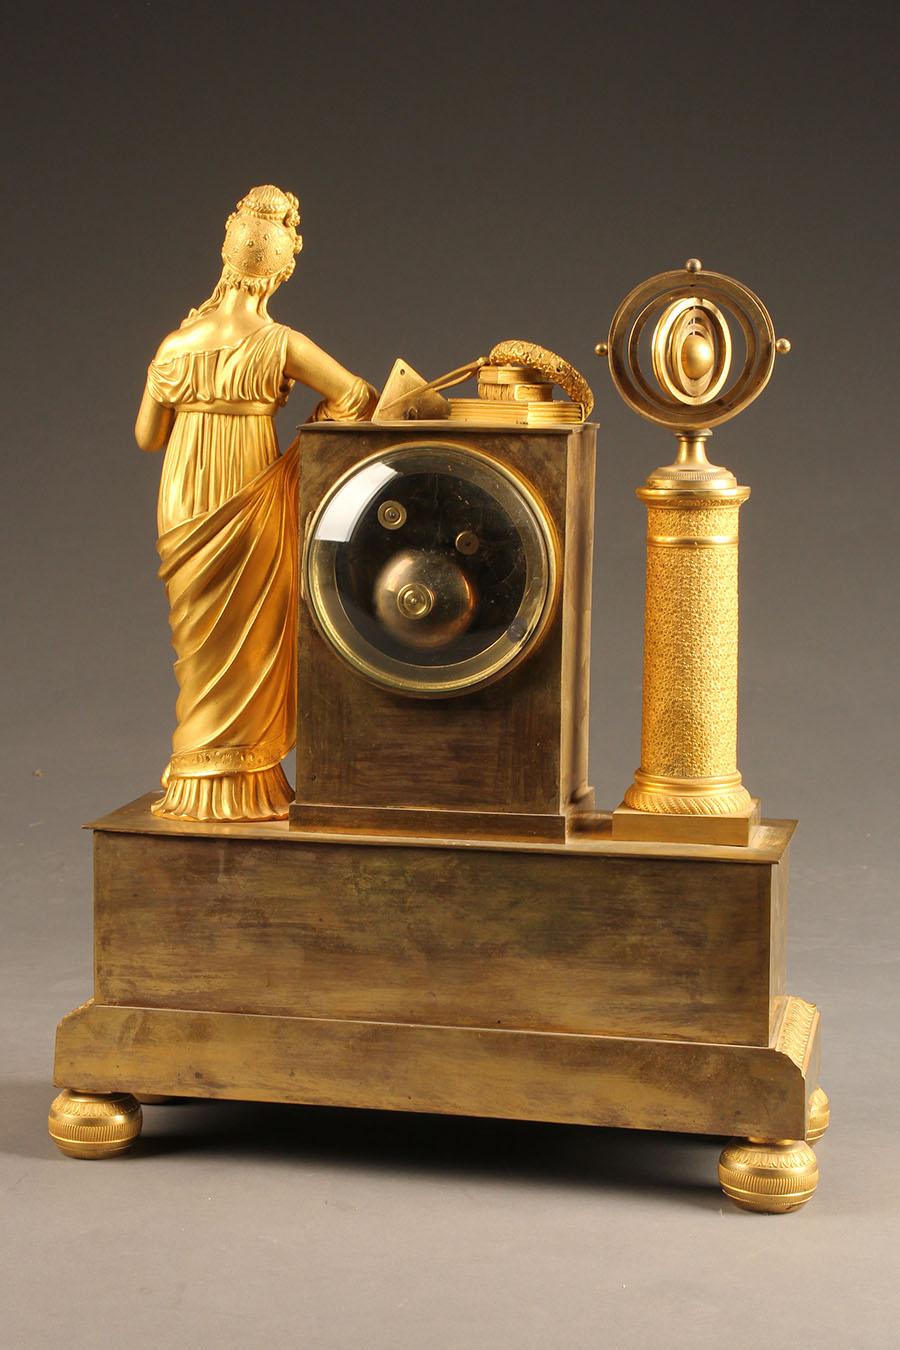 Antique French Bronze Statue Clock With Scientific Theme